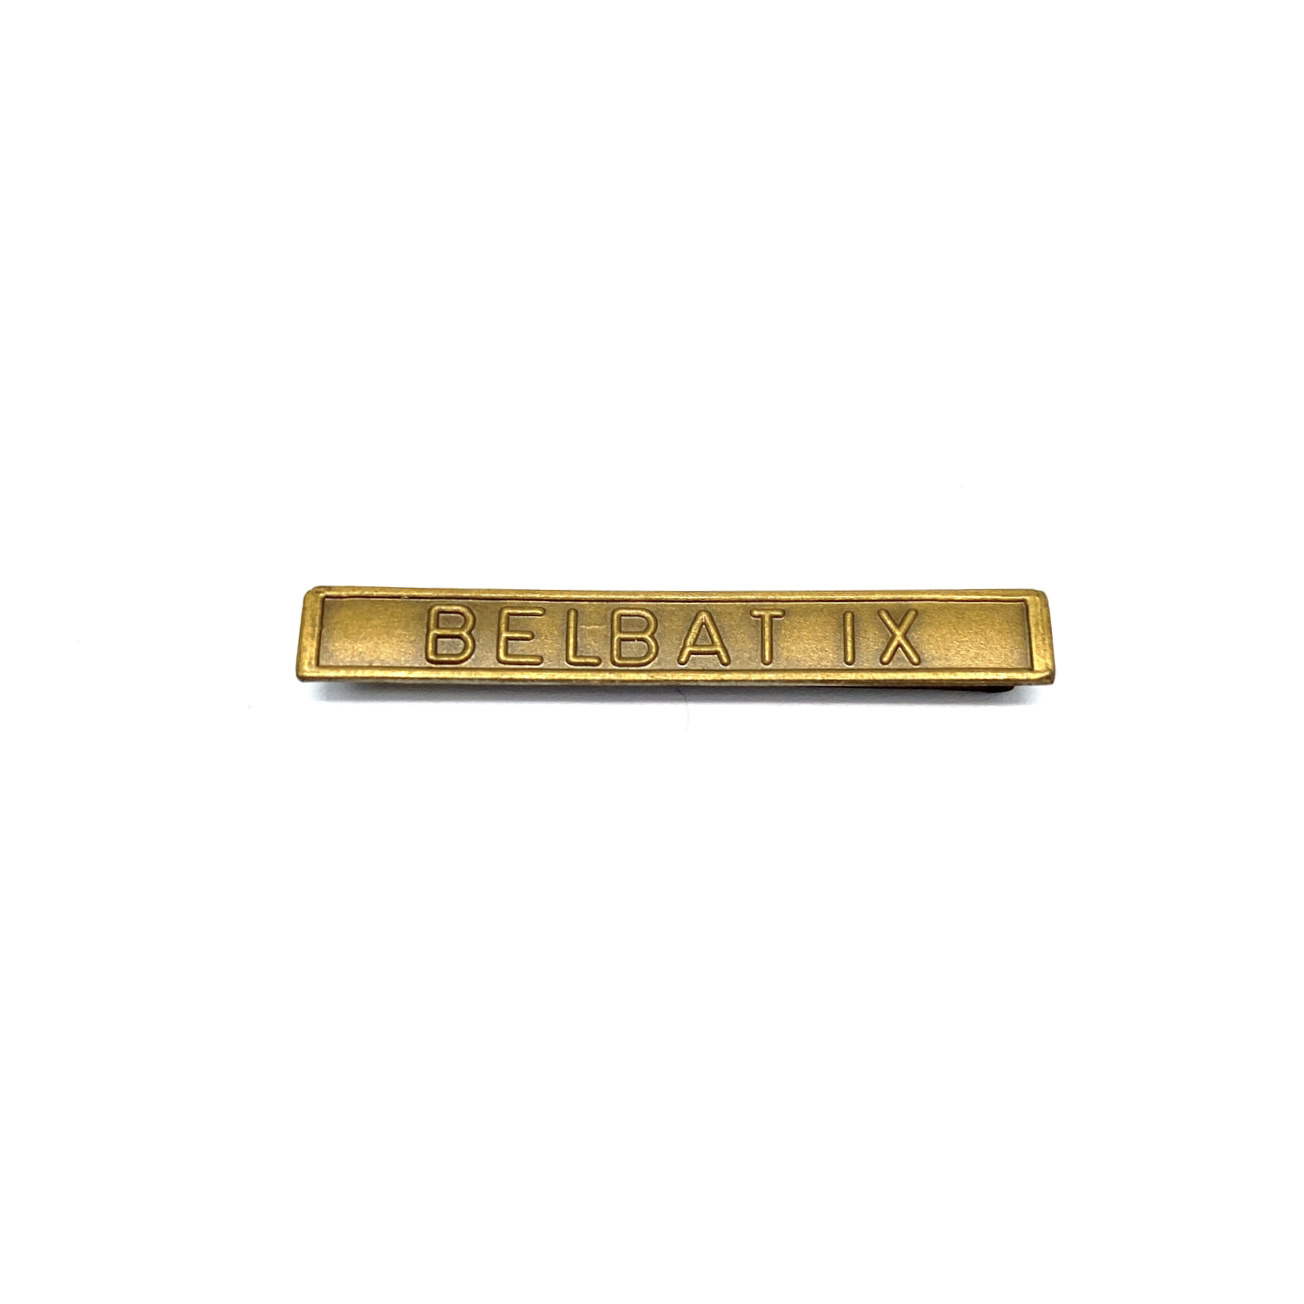 Bar Belbat IX for military medals